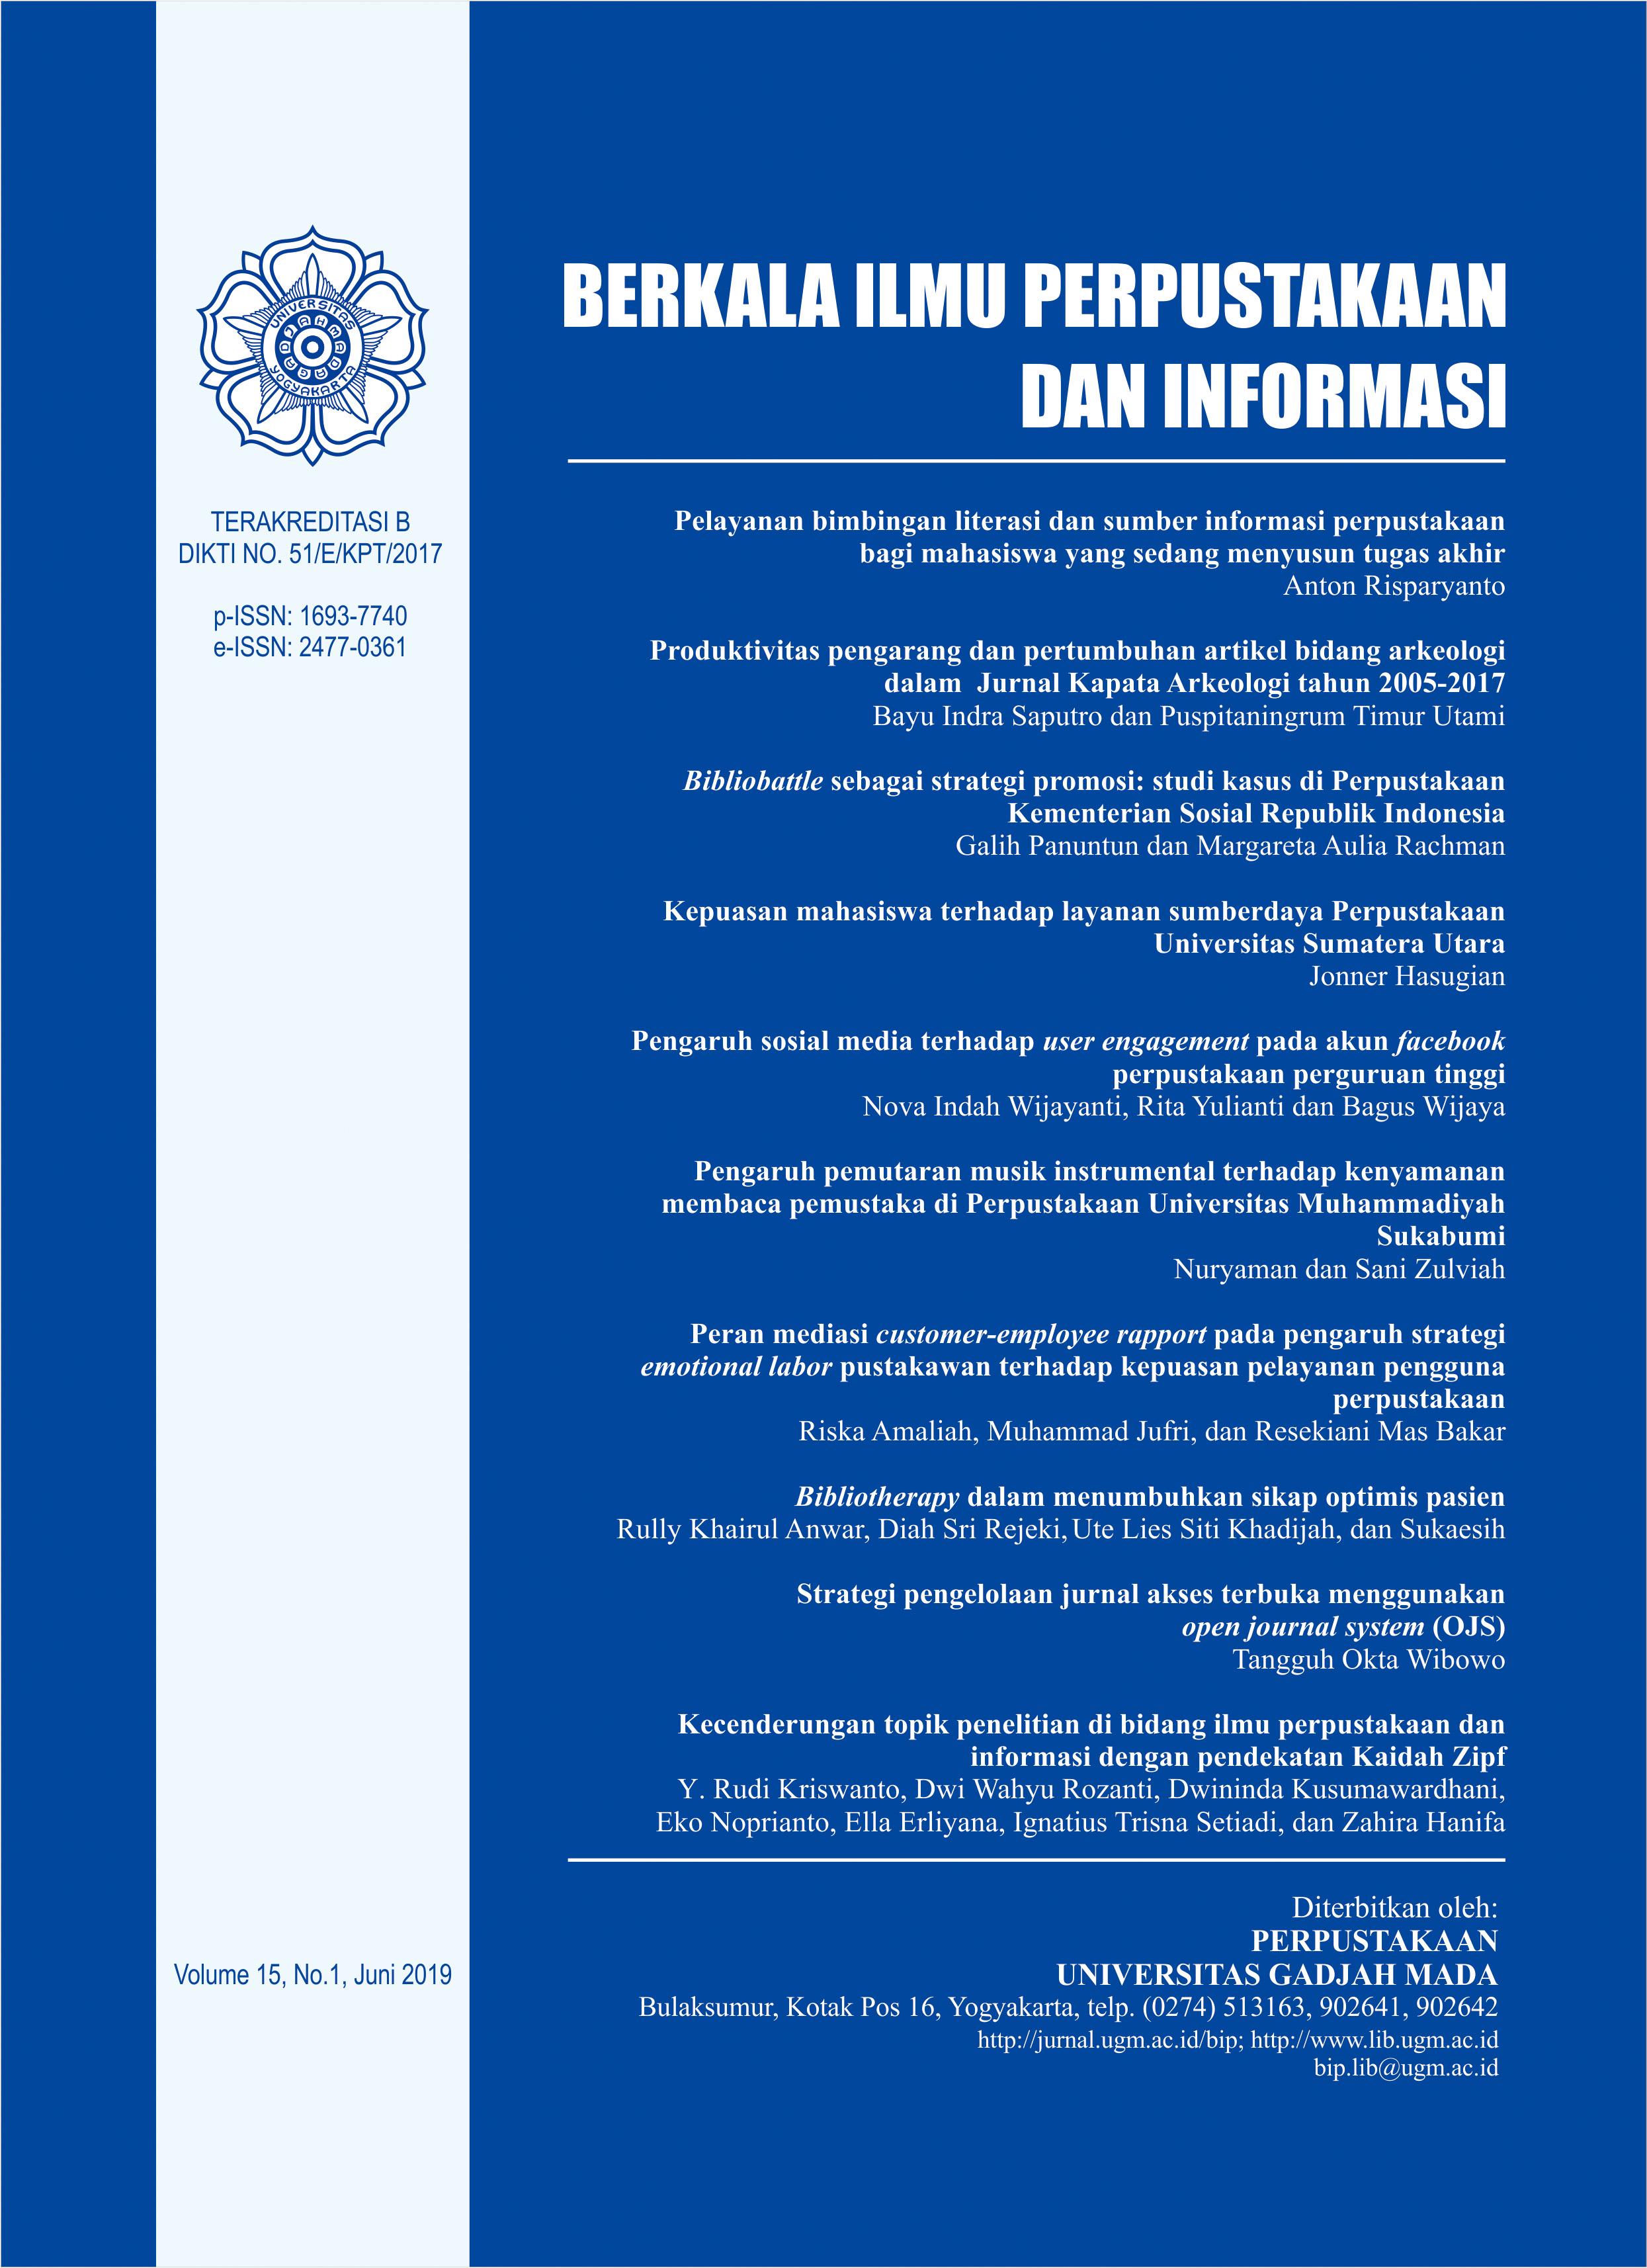 Berkala Ilmu Perpustakaan dan Informasi